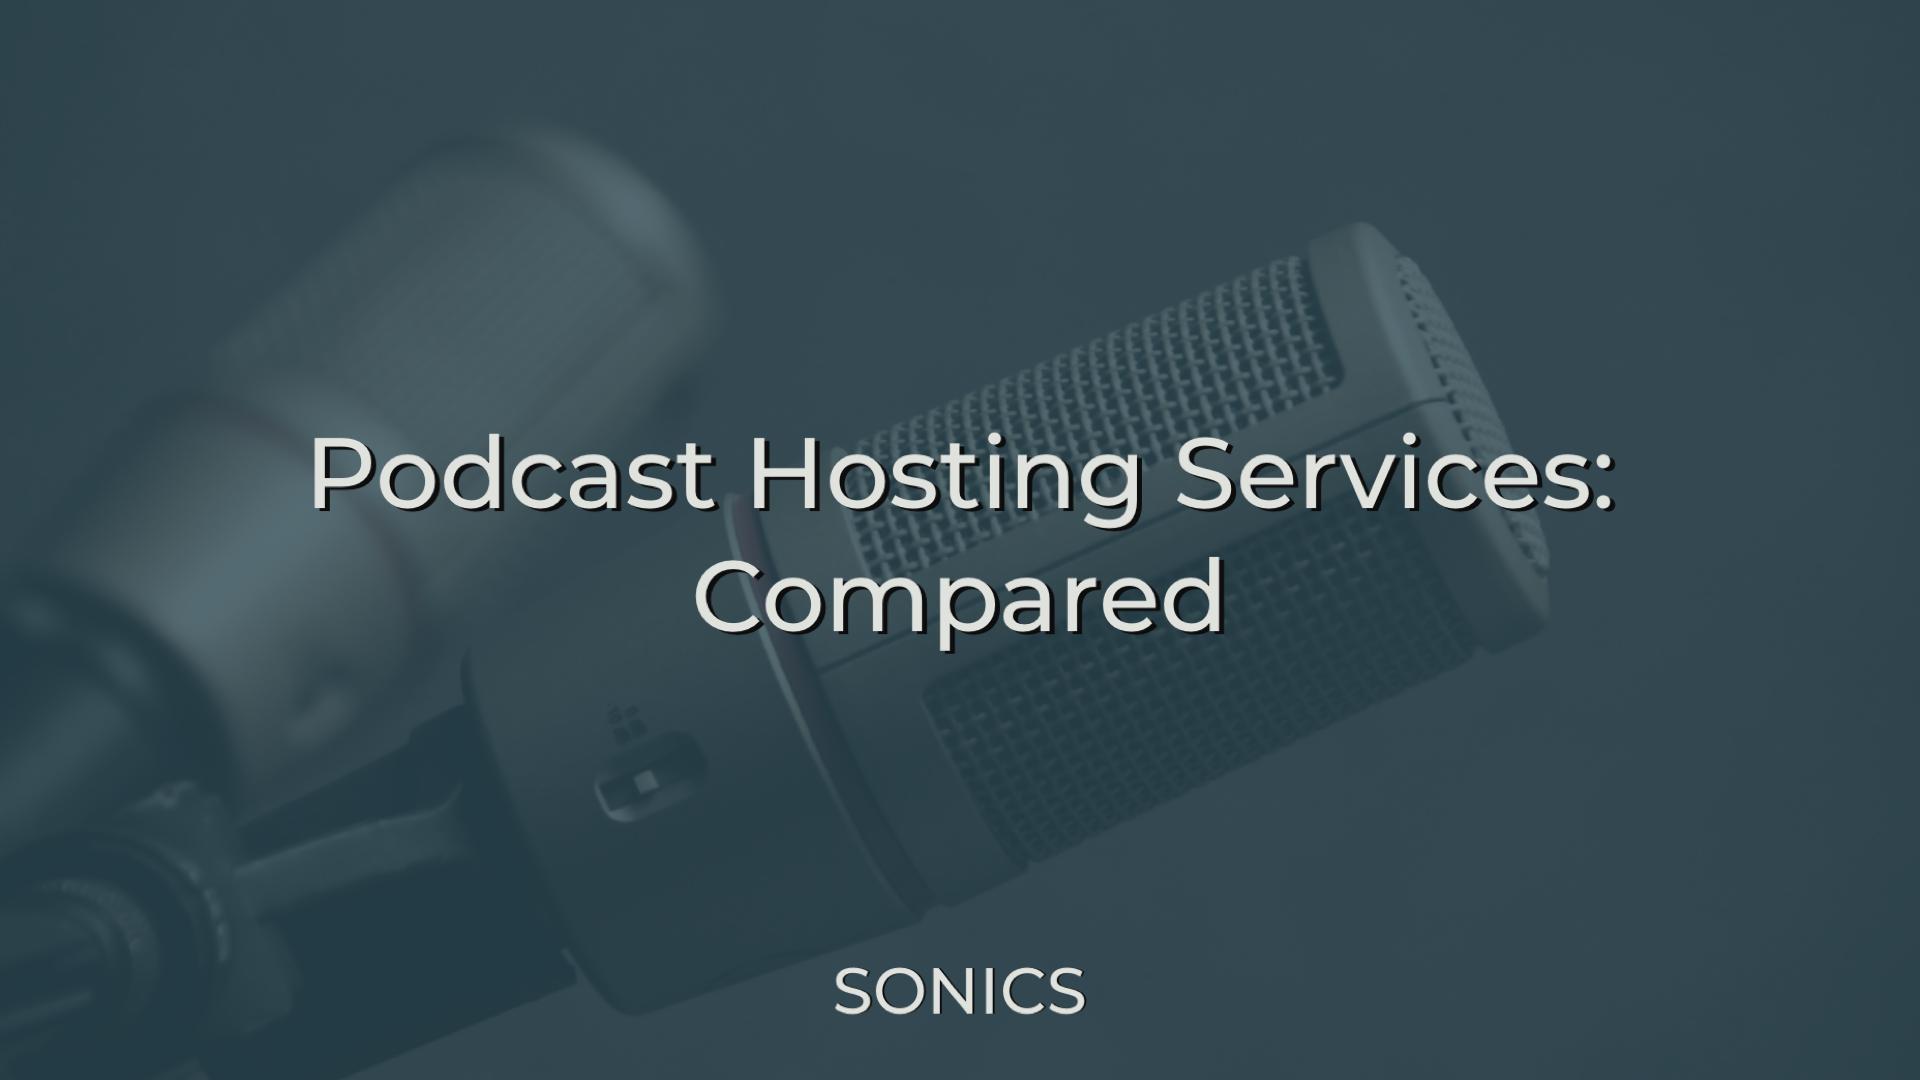 Podcast Hosting Services